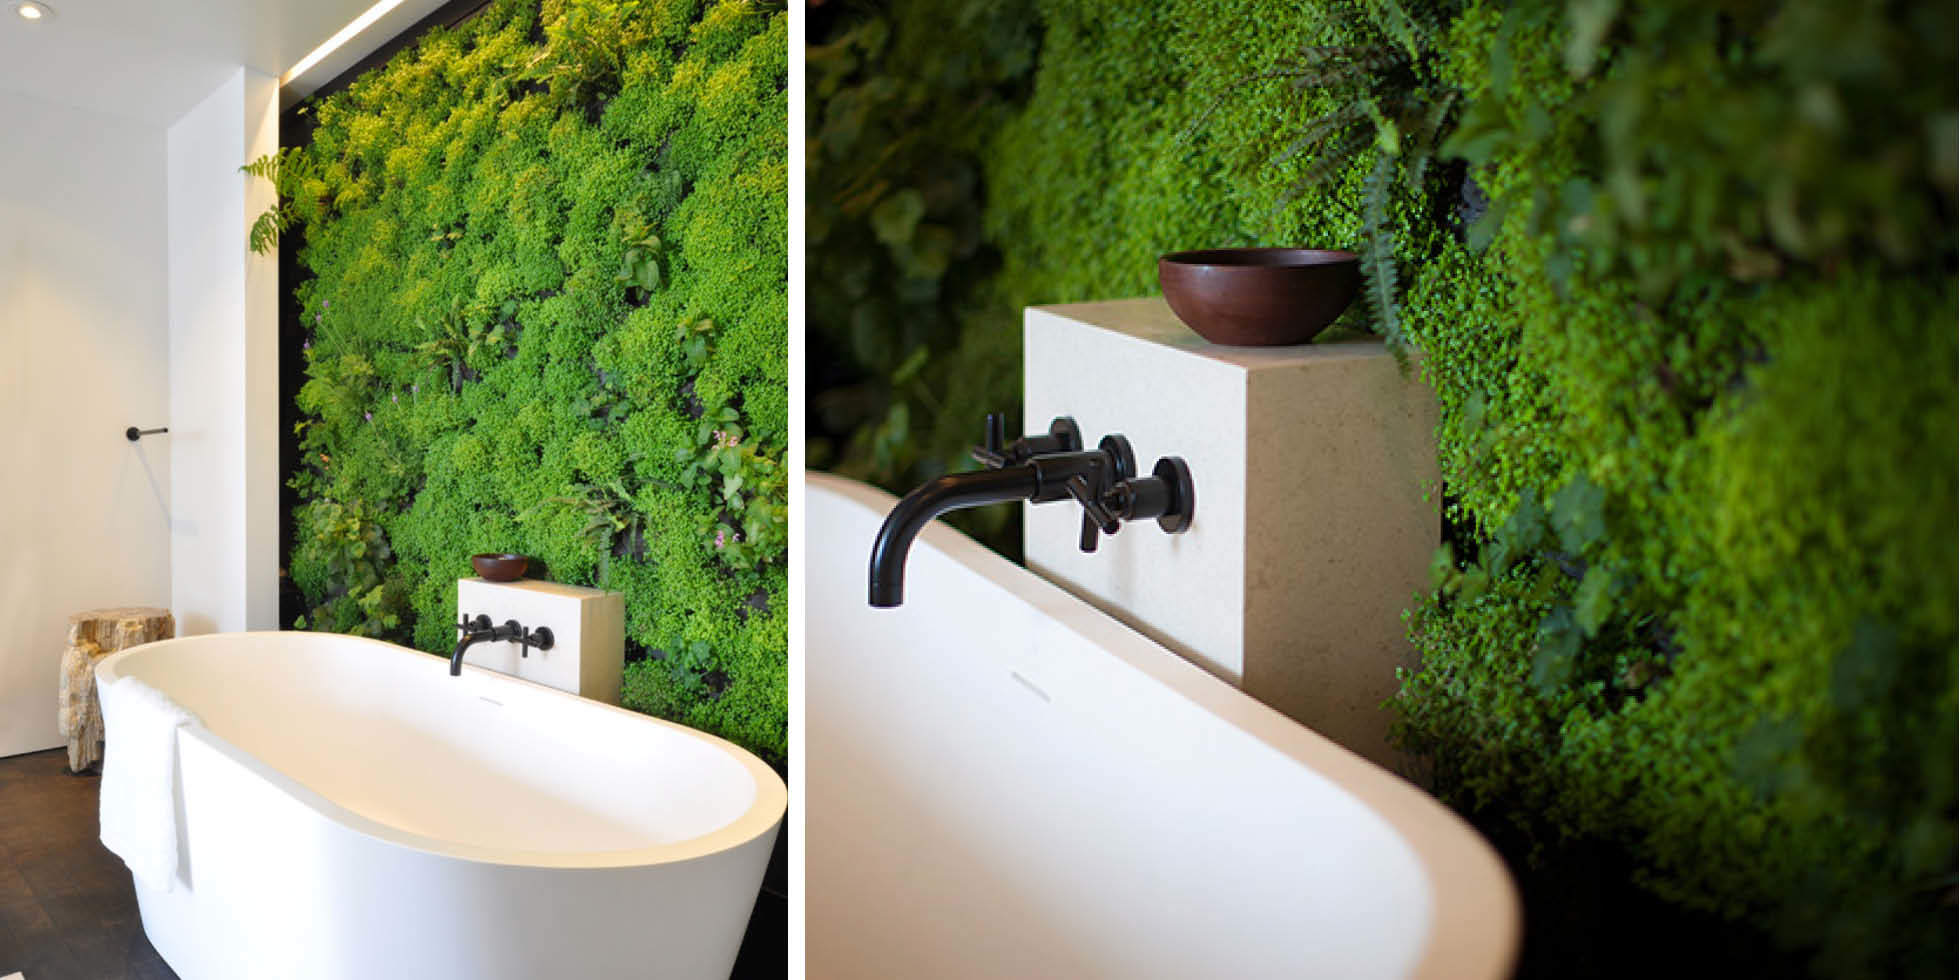 Zen Bathroom Escape Living Wall by Habitat Horticulture - View 1